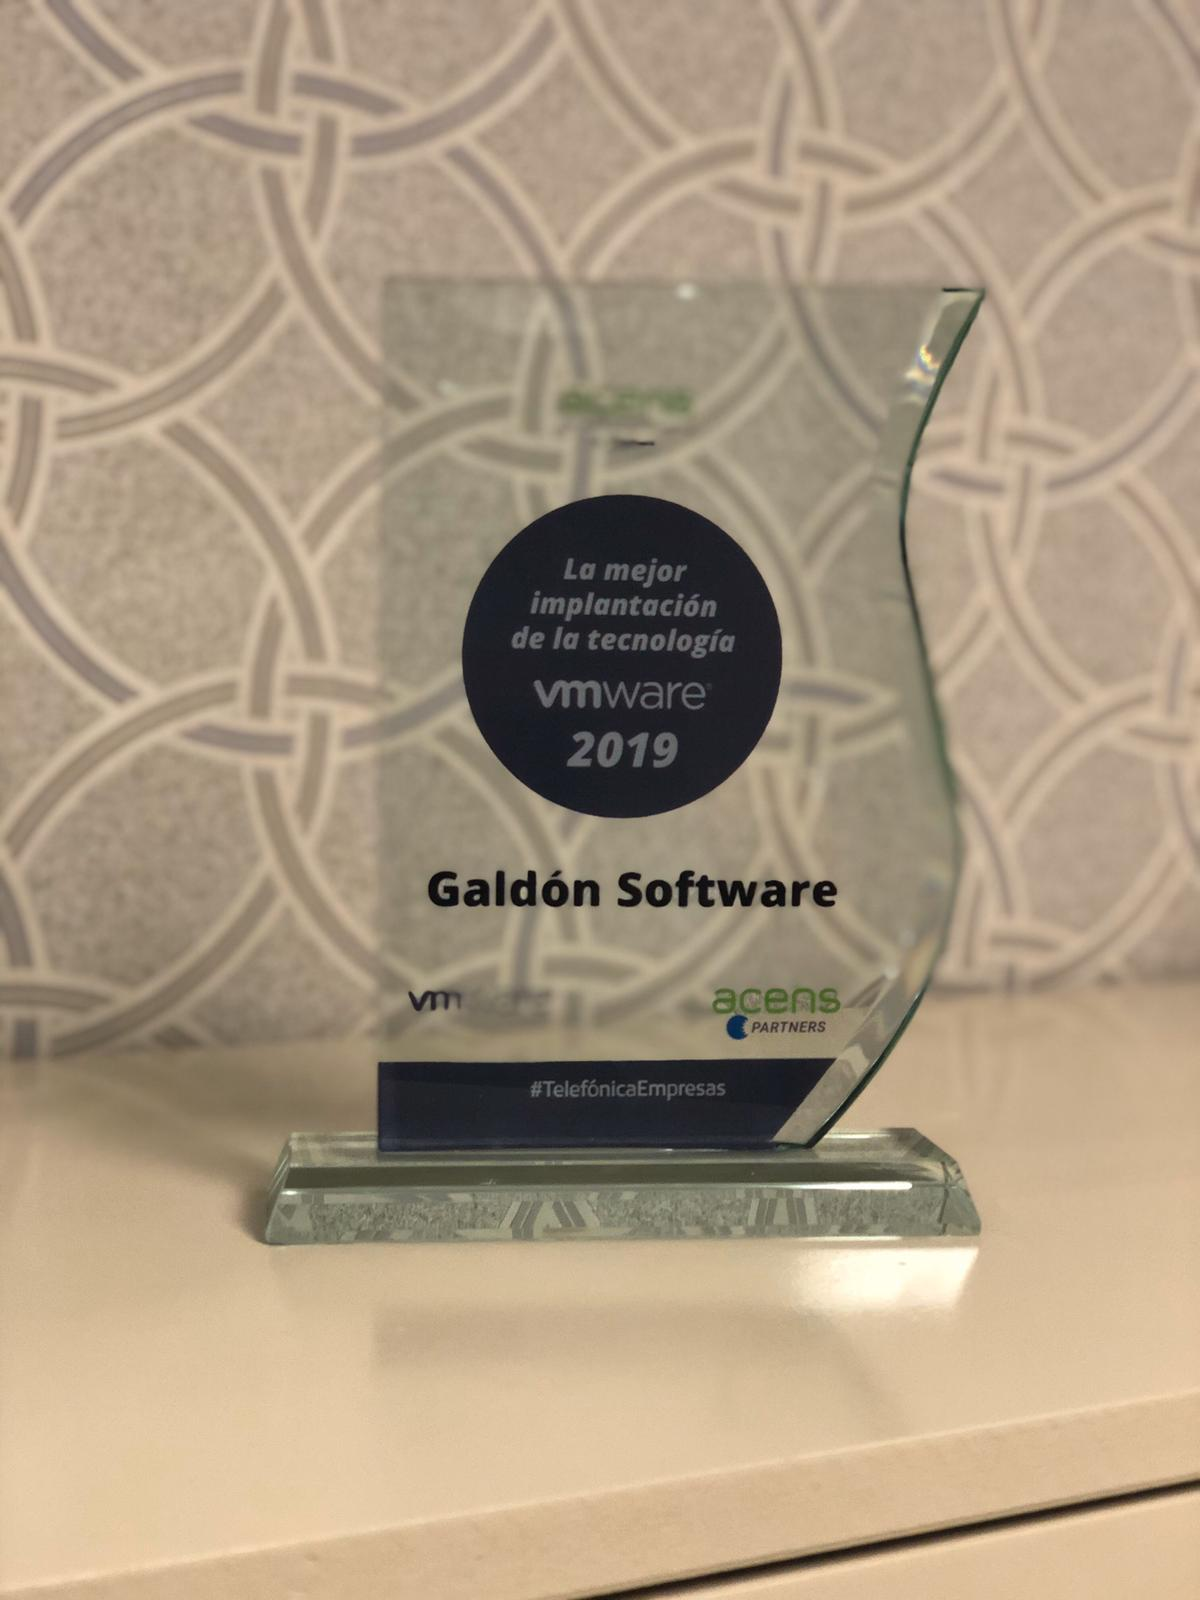 premio VMware 2019 by Acens